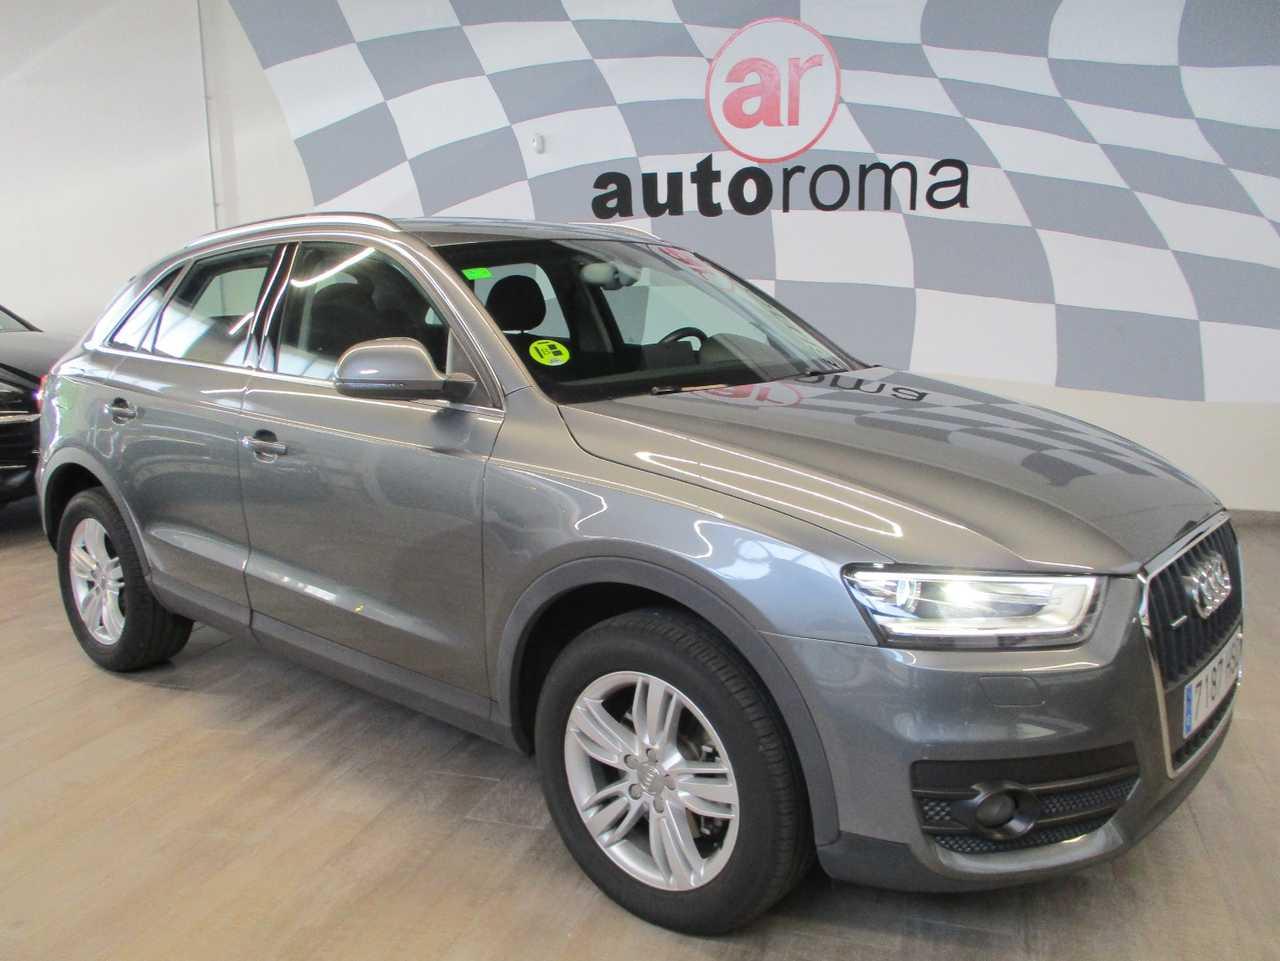 Audi Q3 2.0 TDI QUATTRO AMBITION S-TRONIC   - Foto 1